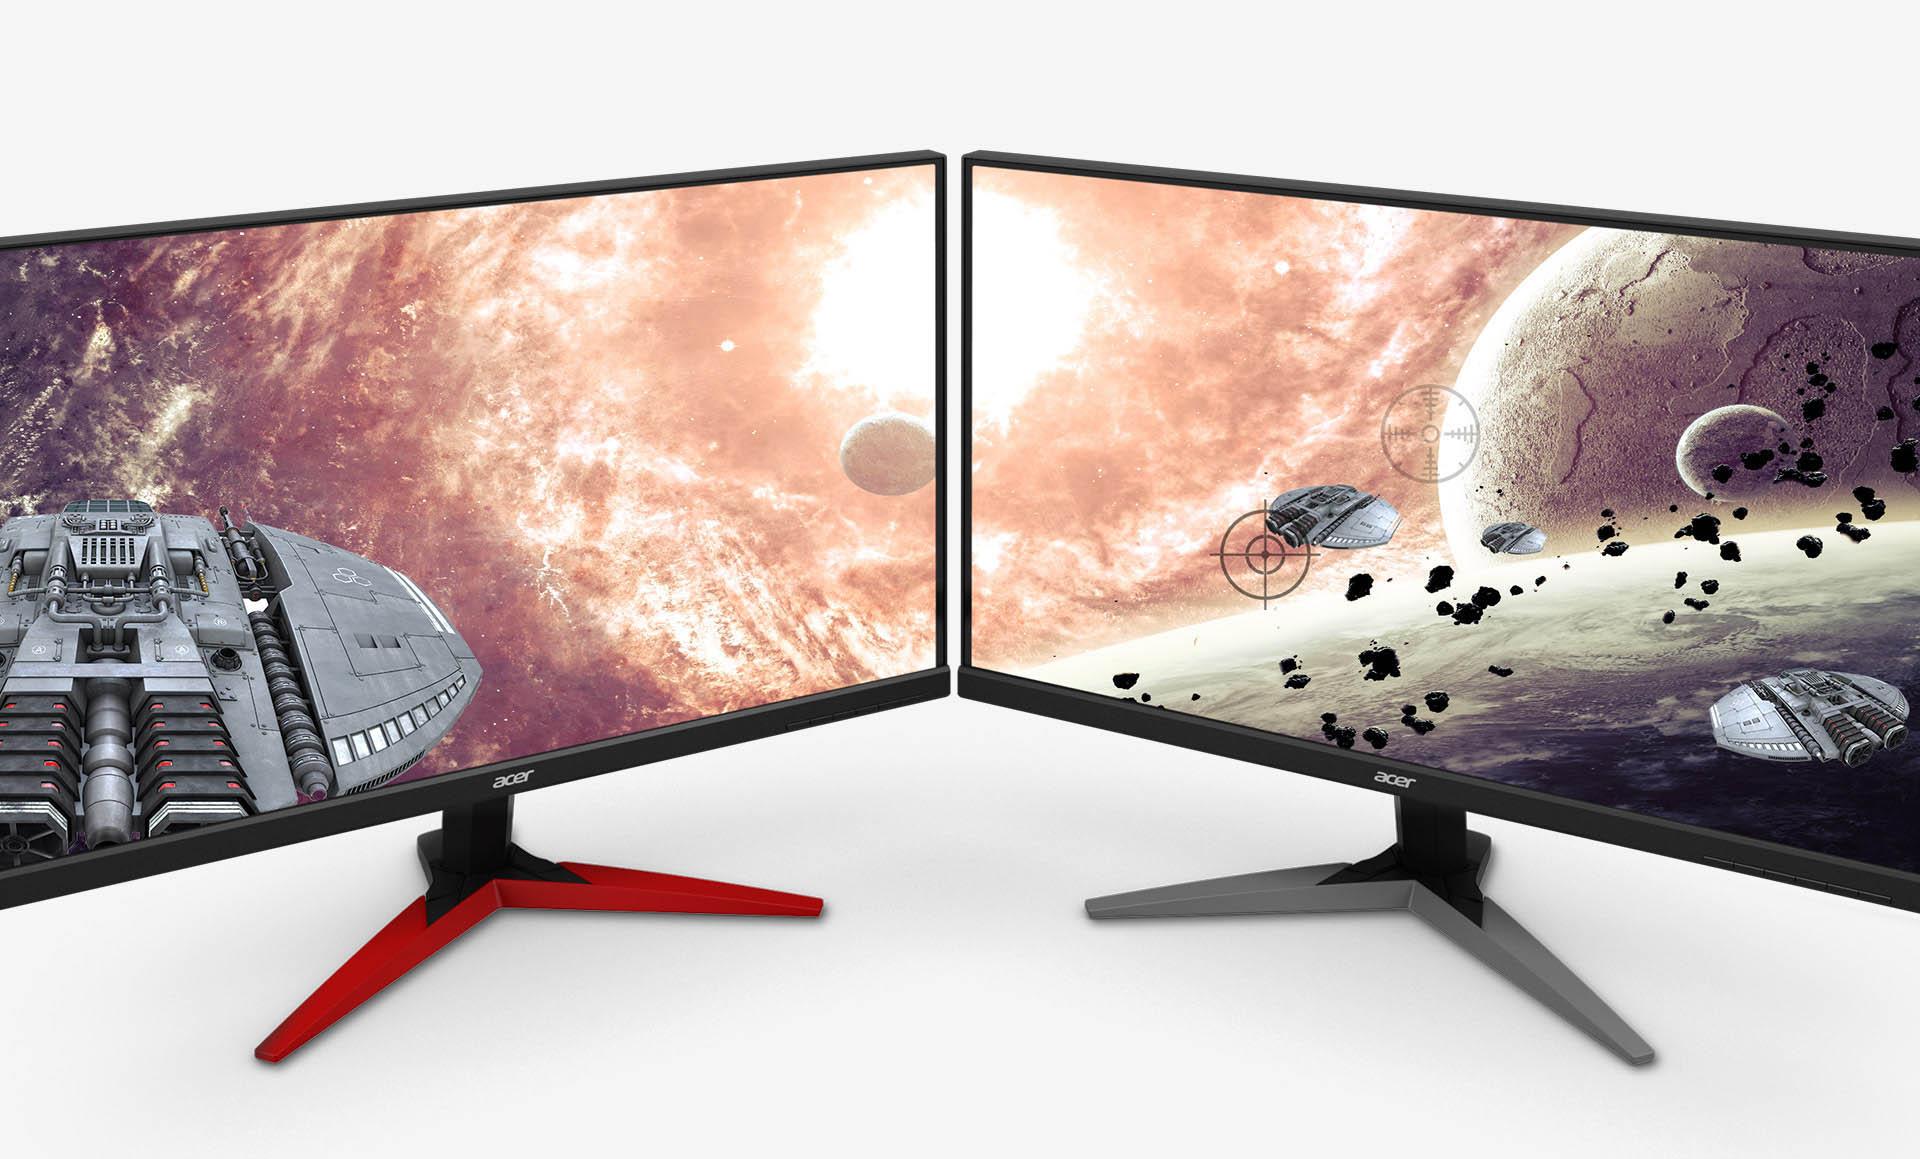 Acer KG251Q-F, monitor PC gaming murah 2021